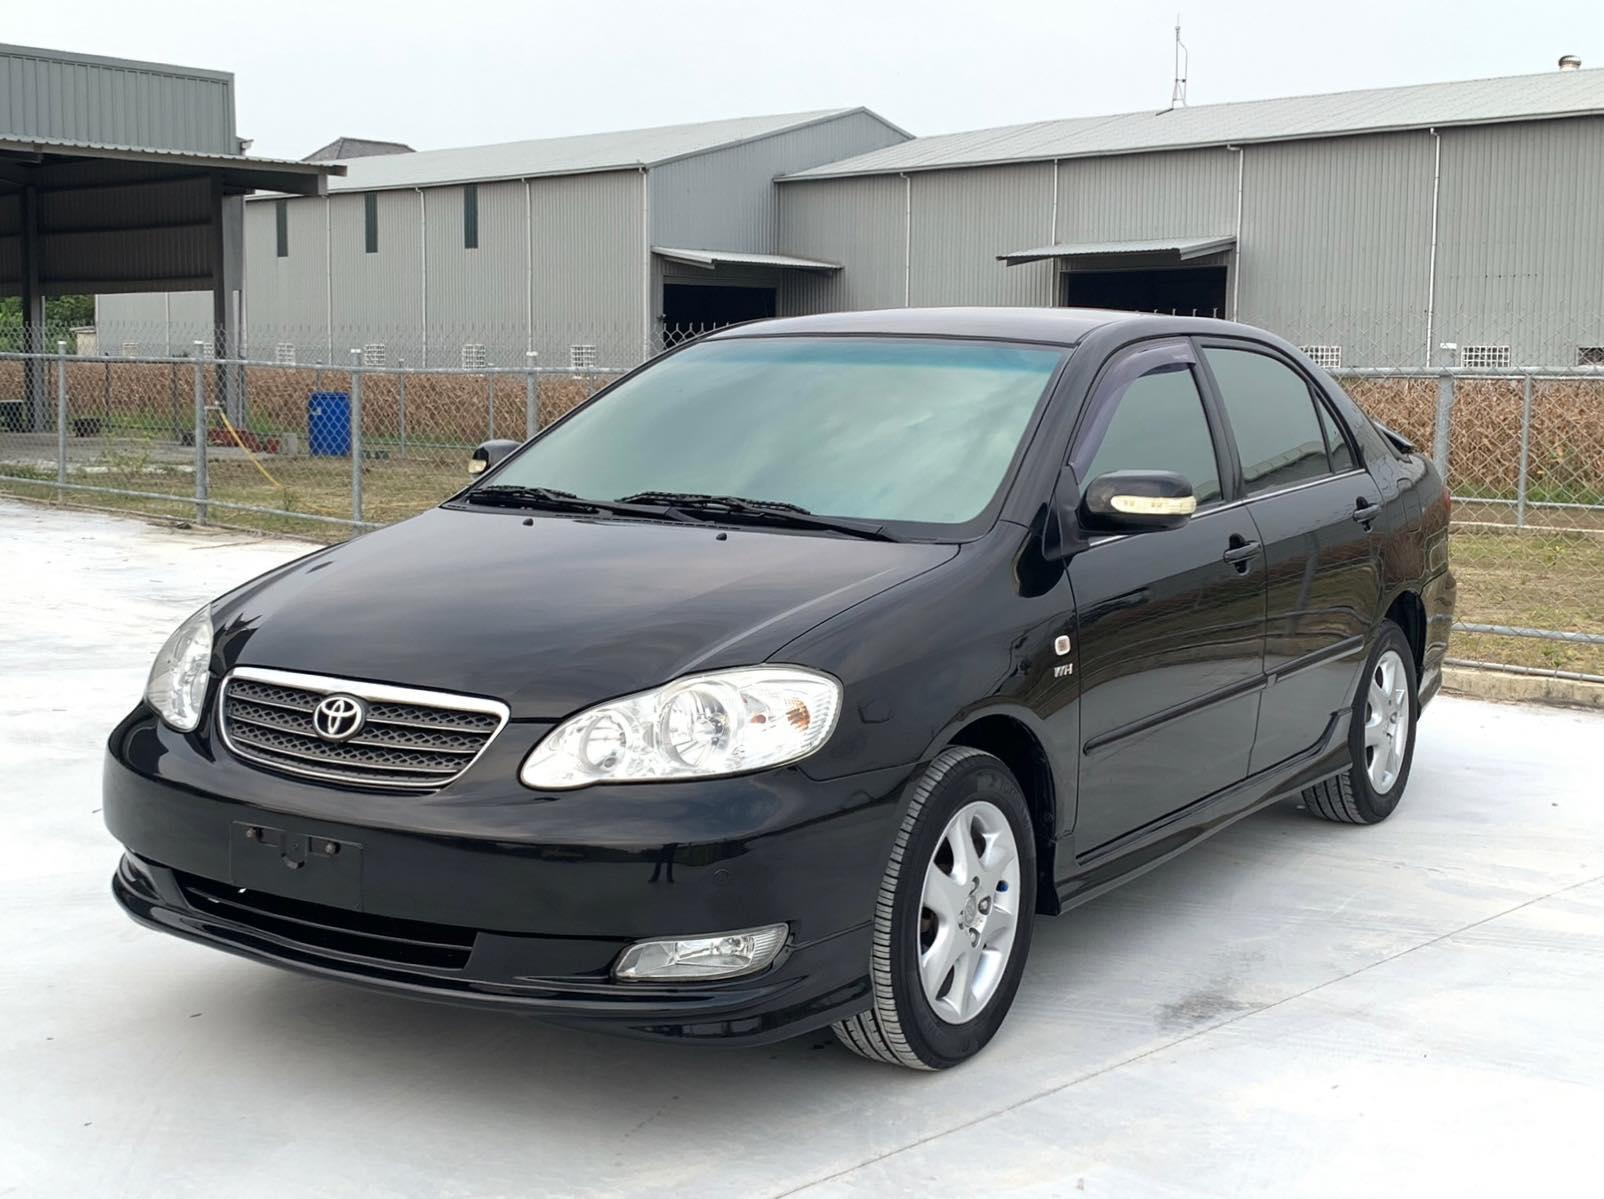 2005 Toyota 豐田 Corolla altis